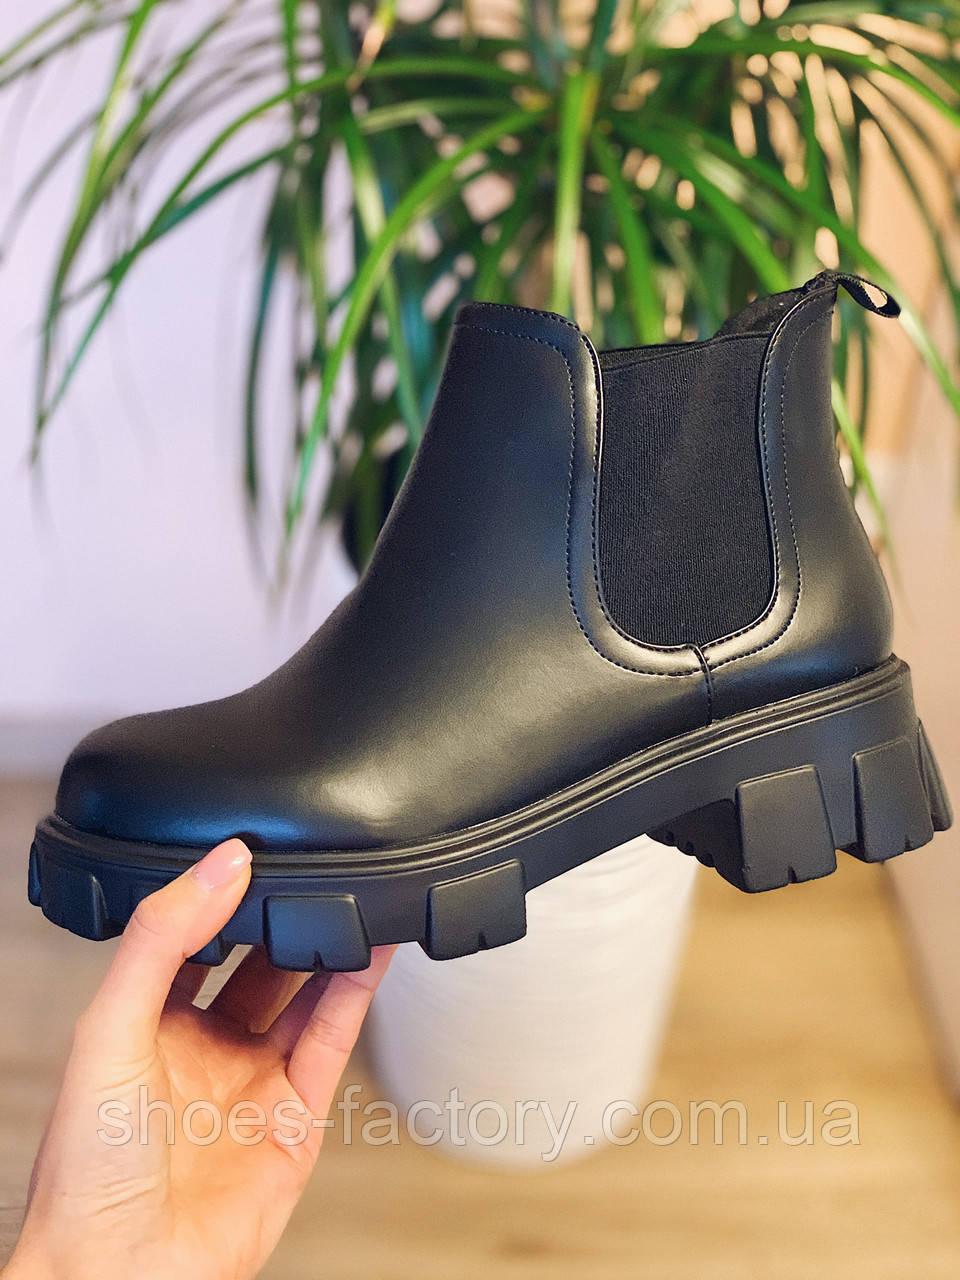 Ботинки женские в стиле Челси CHELSEA 2020